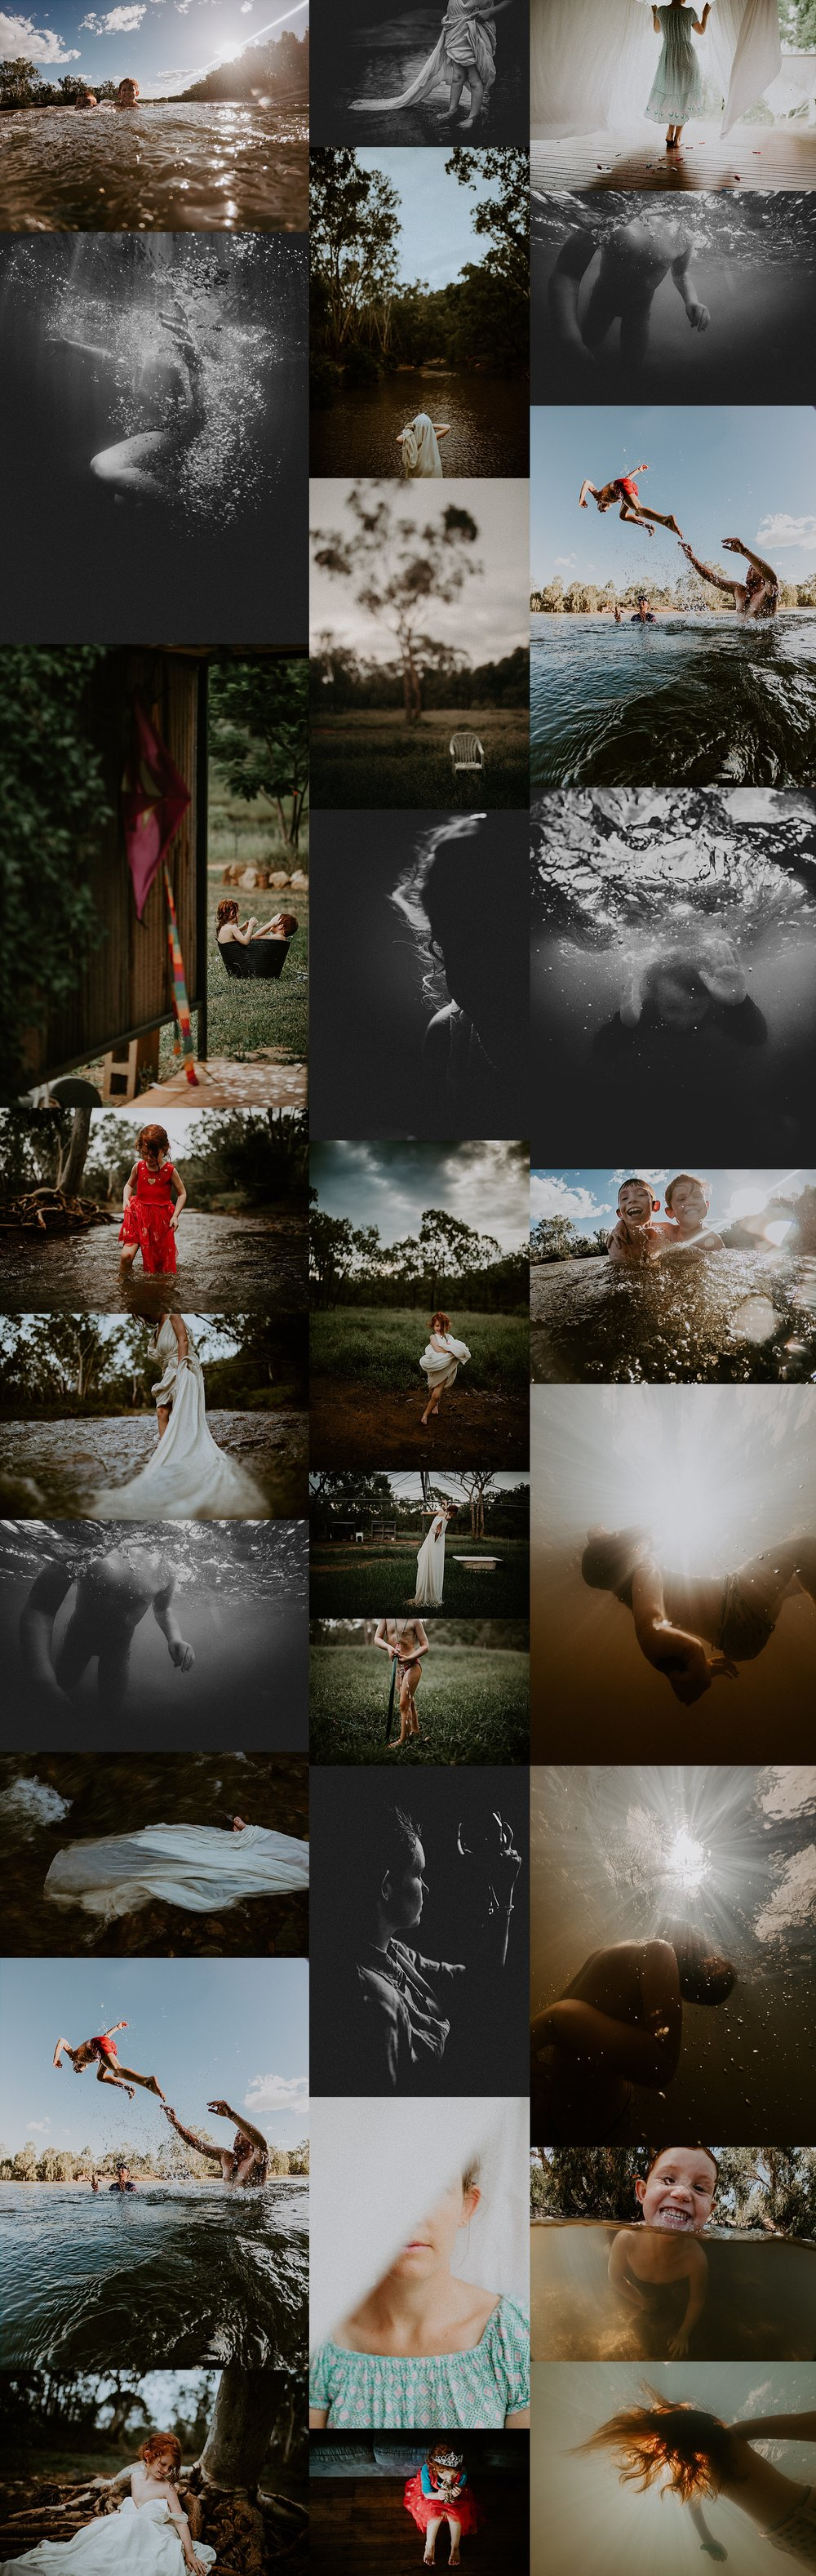 Camilla-French-Townsville-Cairns-Mission-Beach-Port-Douglas-Queensland-family-lifestyle-wedding-eleopment-photographer_0147.jpg